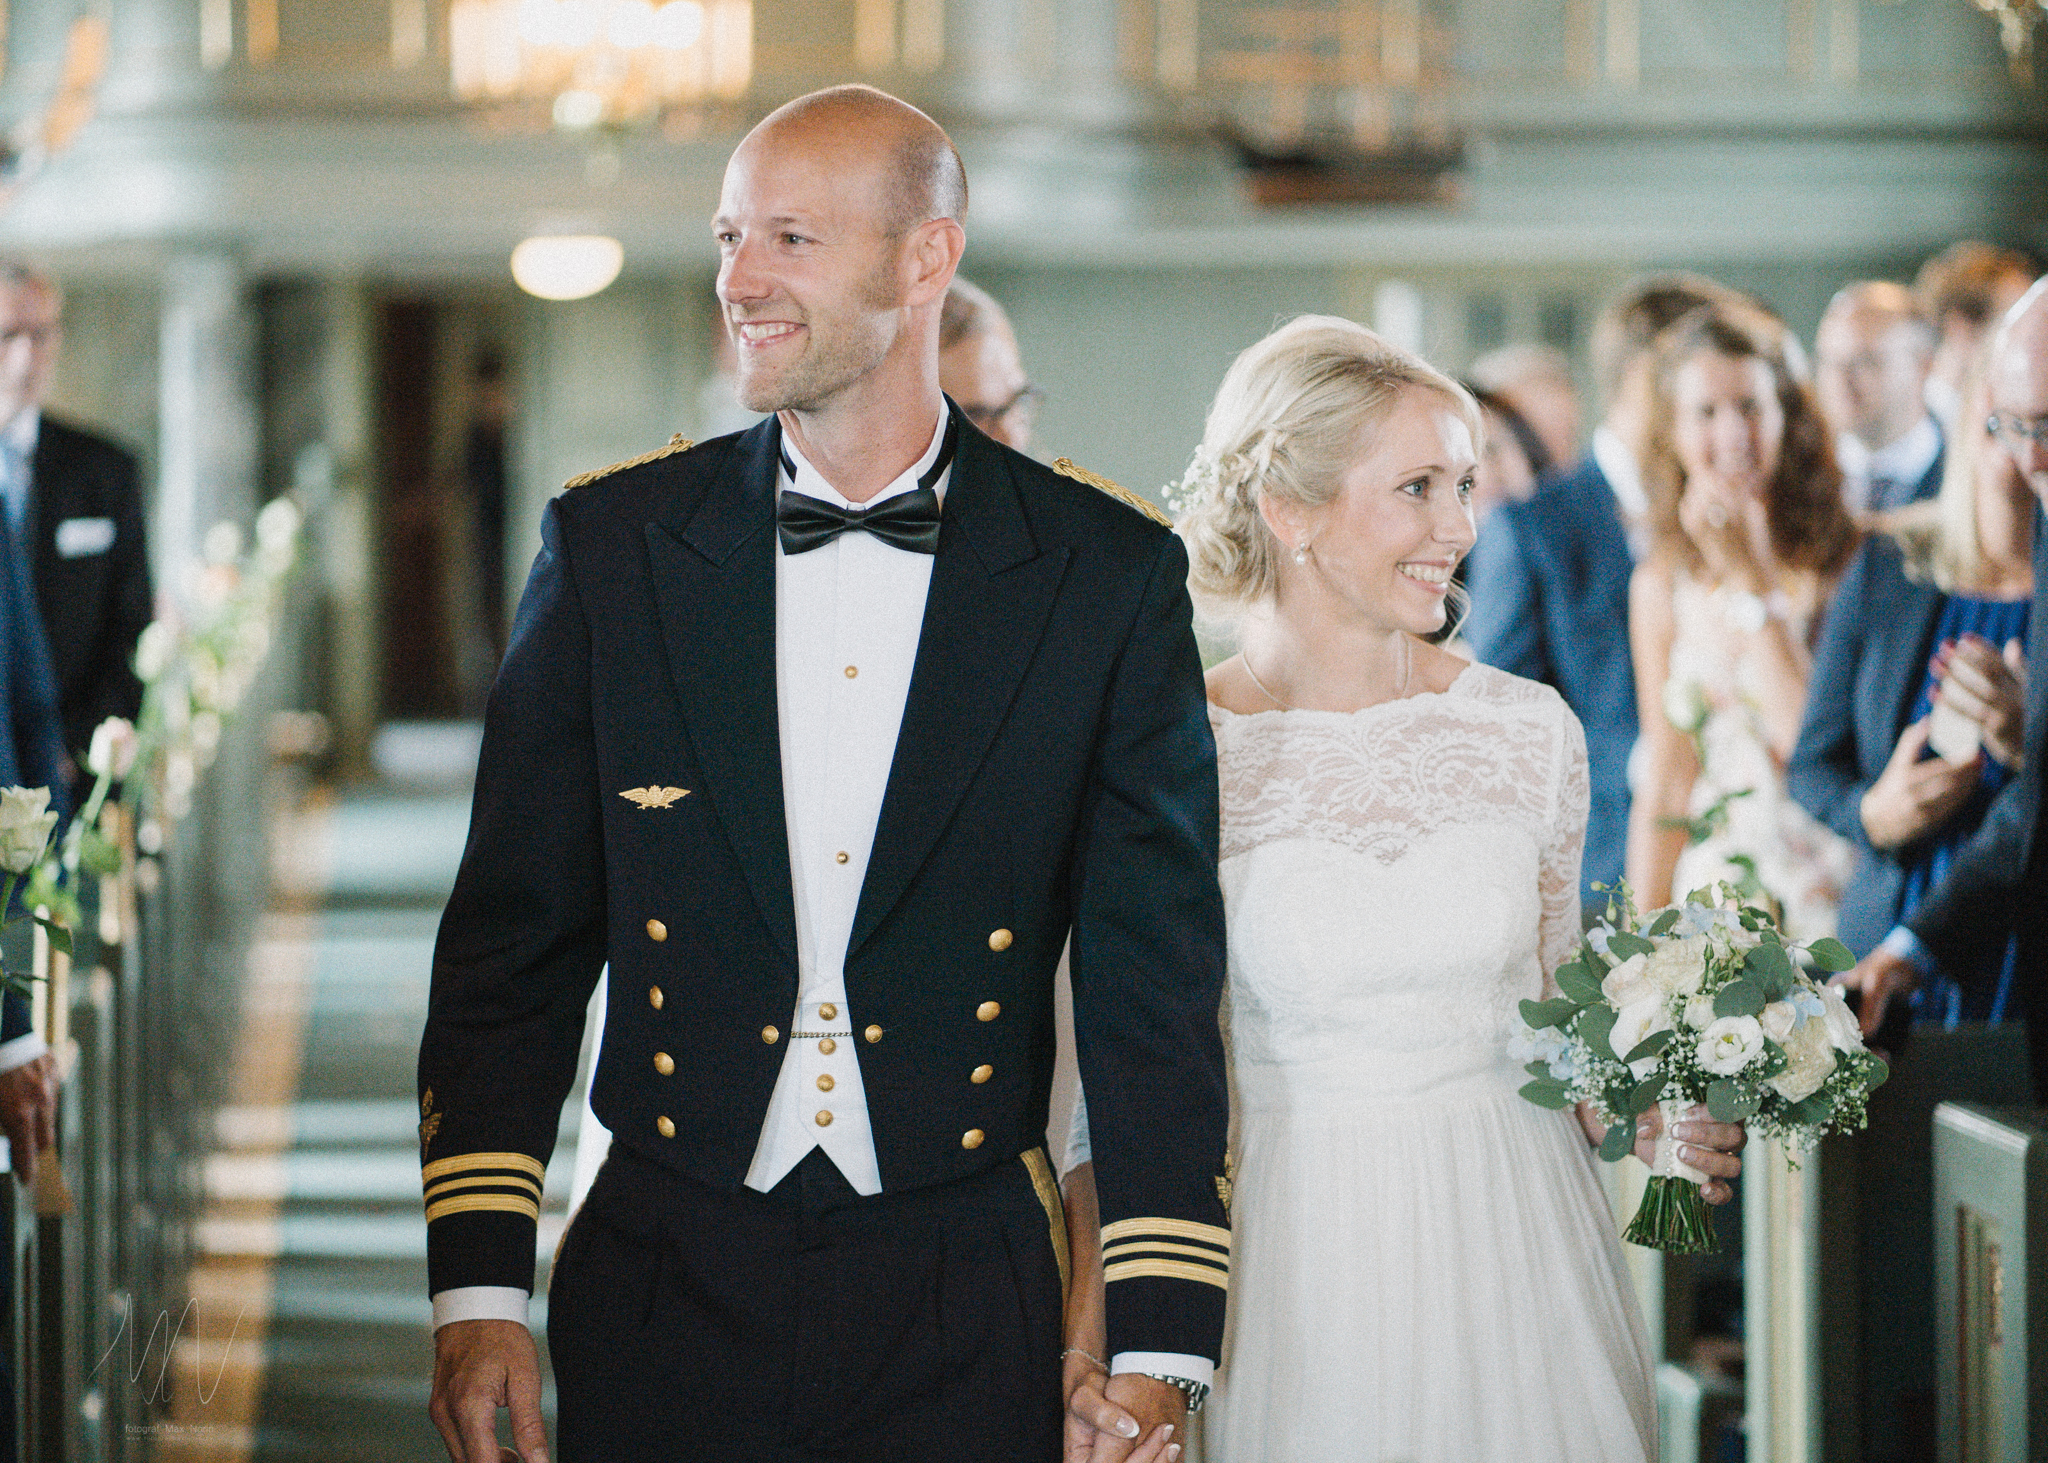 Bröllop-fotografmaxnorin.se-MariaMarcus-60.JPG